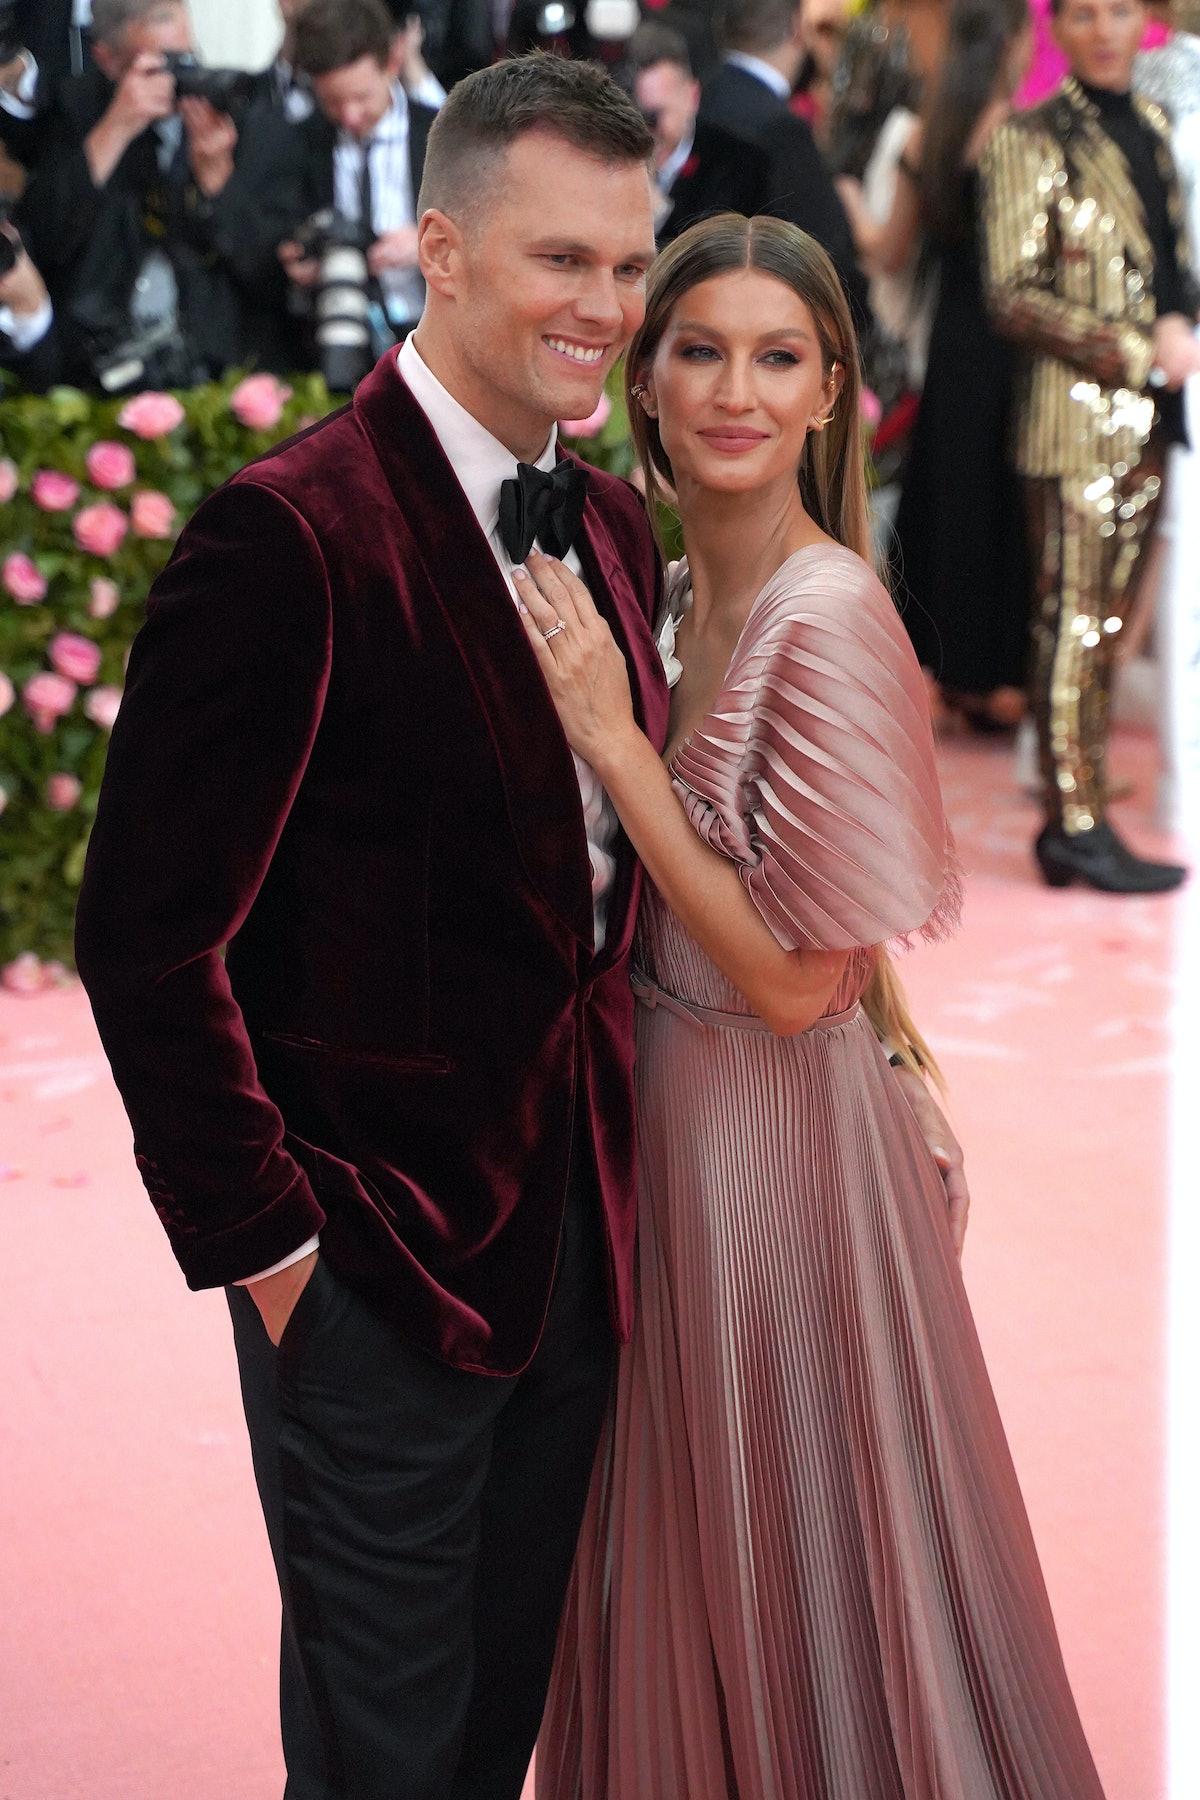 Tom Brady and Gisele Bundchen hit the red carpet.